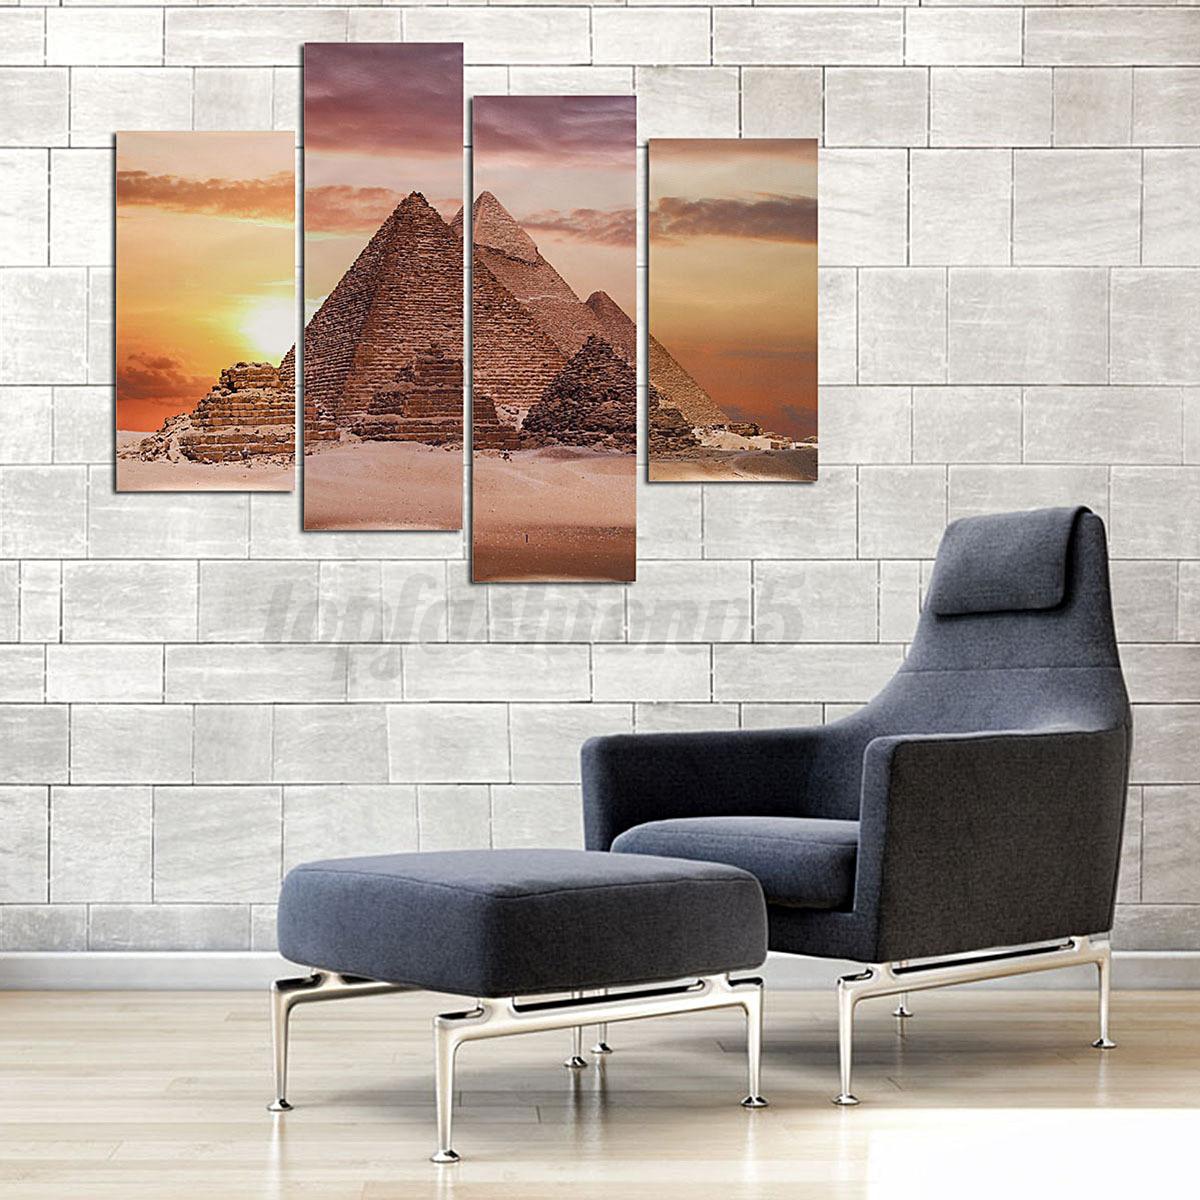 Moderno multistyle stampa tela arredamento arredo casa for Arredo casa design